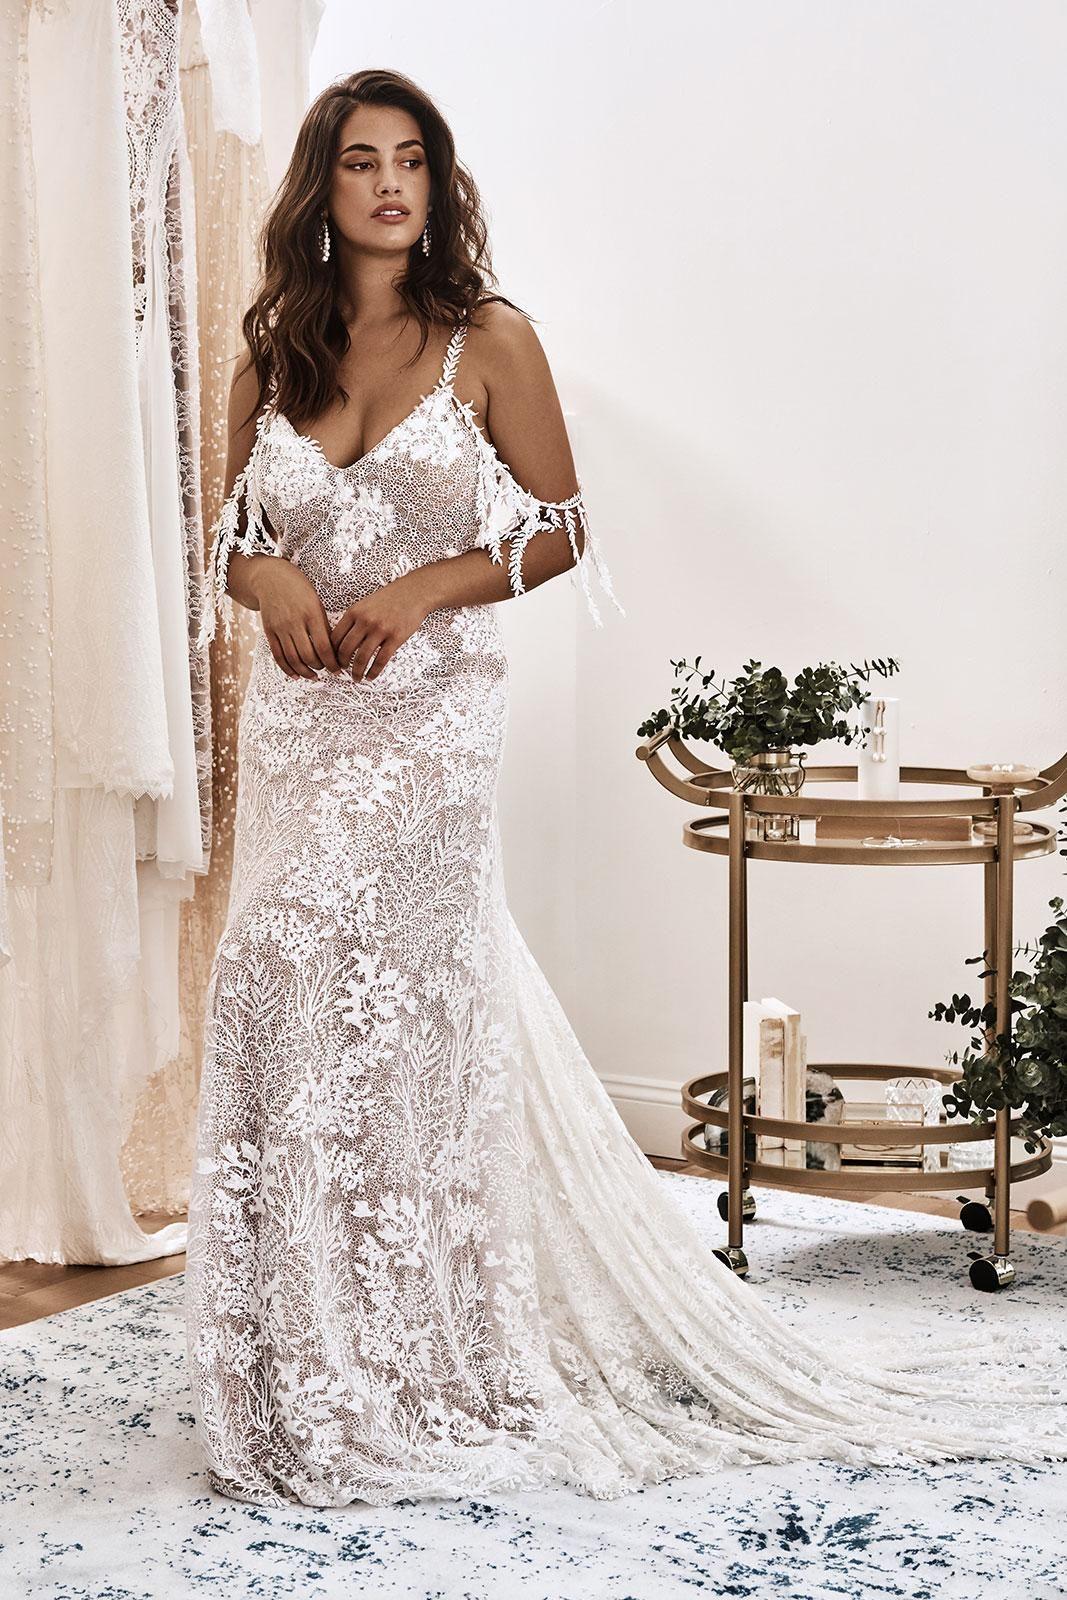 Sol Gown Lace Wedding Dress Grace Loves Lace Wedding Dresses Lace Grace Loves Lace Wedding Gown Accessories